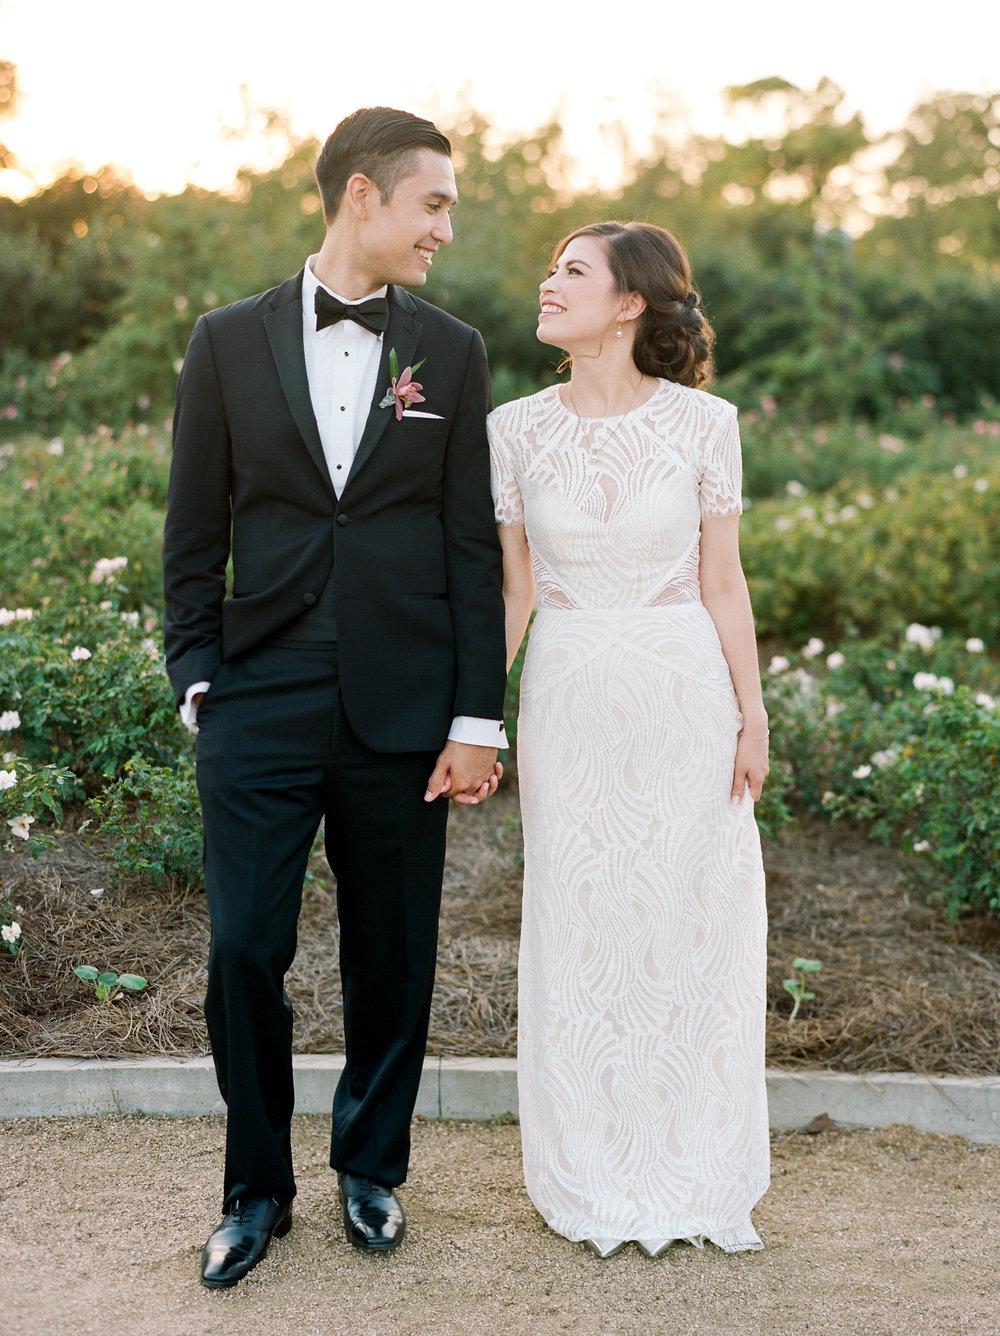 The-Knot-Texas-Magazine-Wedding-Top-Best-Houston-Wedding-Photographer-Fine-Art-Film-Dana-Fernandez-Photography-133.jpg